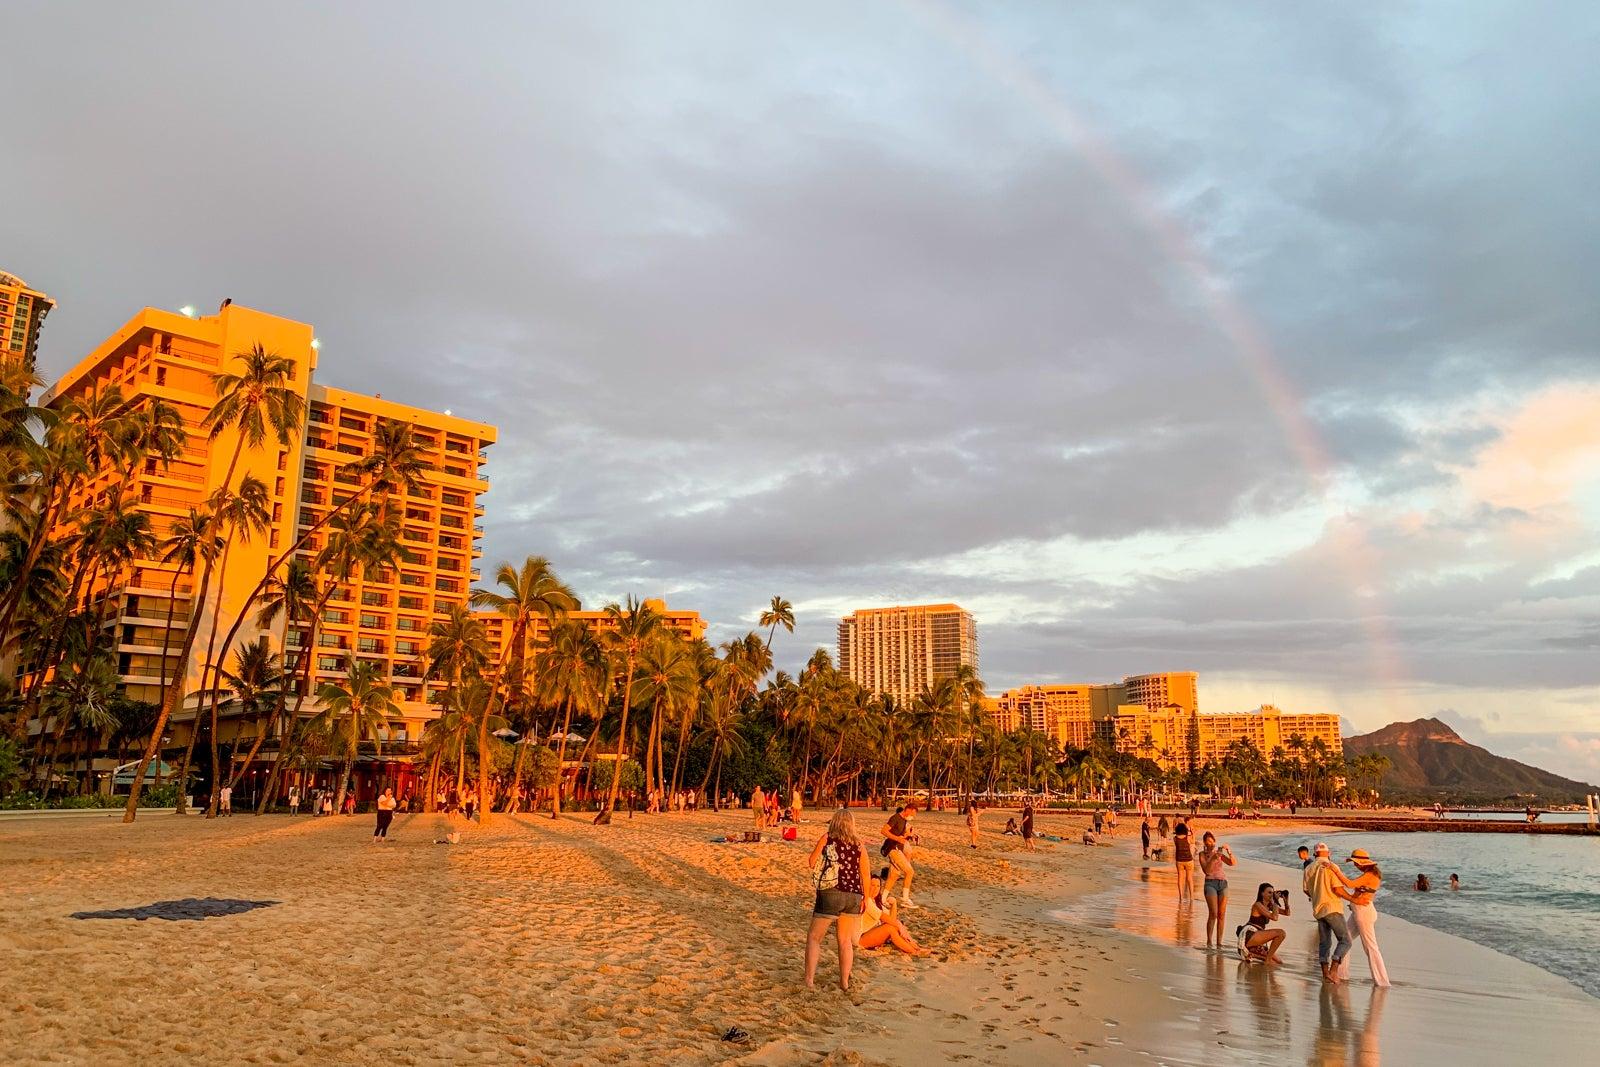 Flawed diamond: A stay at the Hilton Hawaiian Village Waikiki - The Points Guy